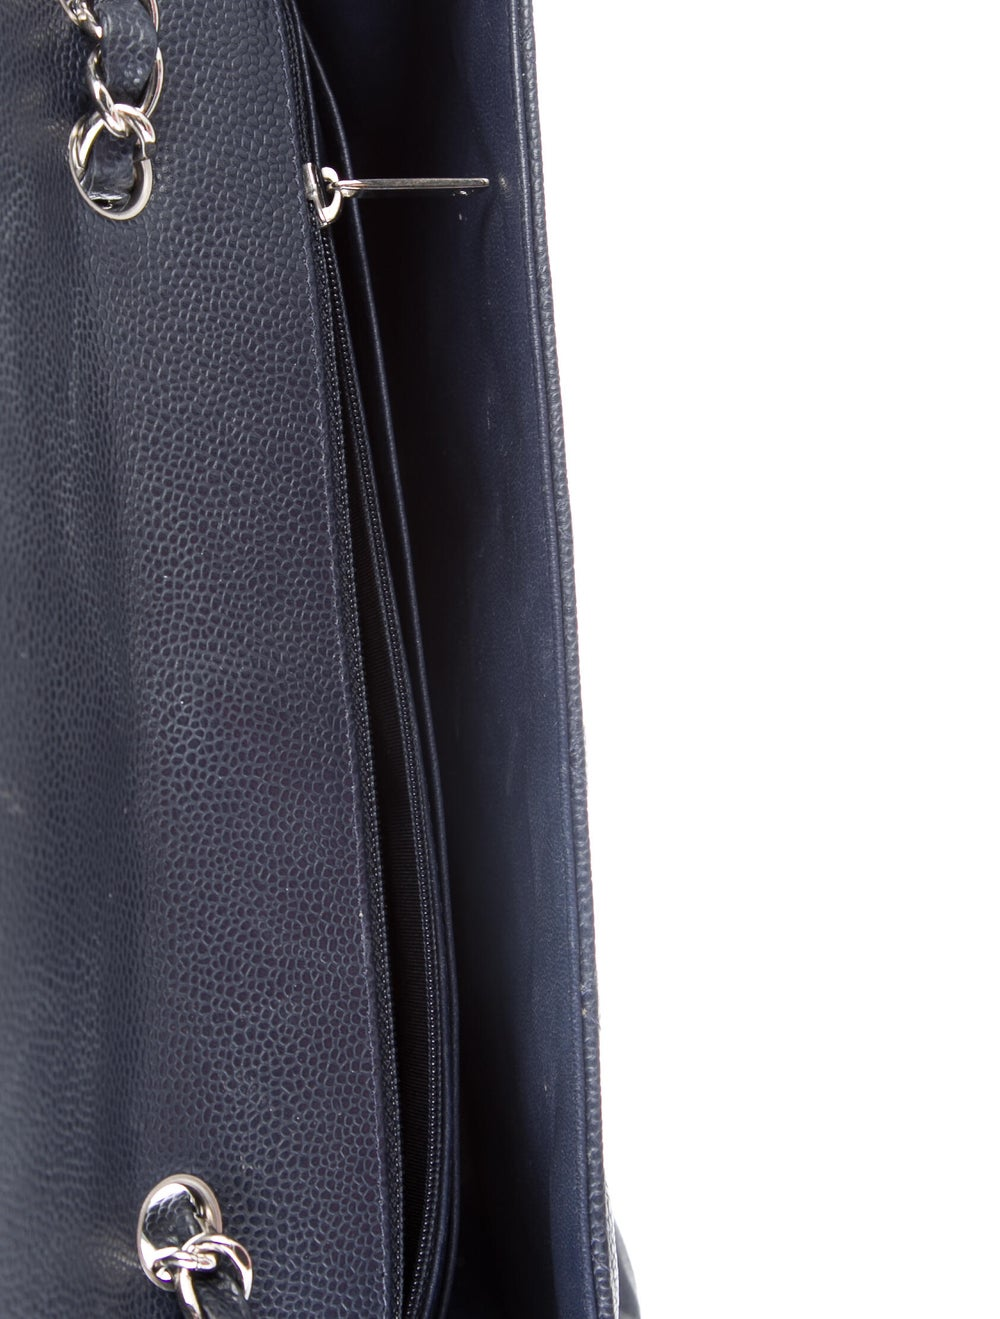 Chanel Jumbo Single Flap Bag Blue - image 5